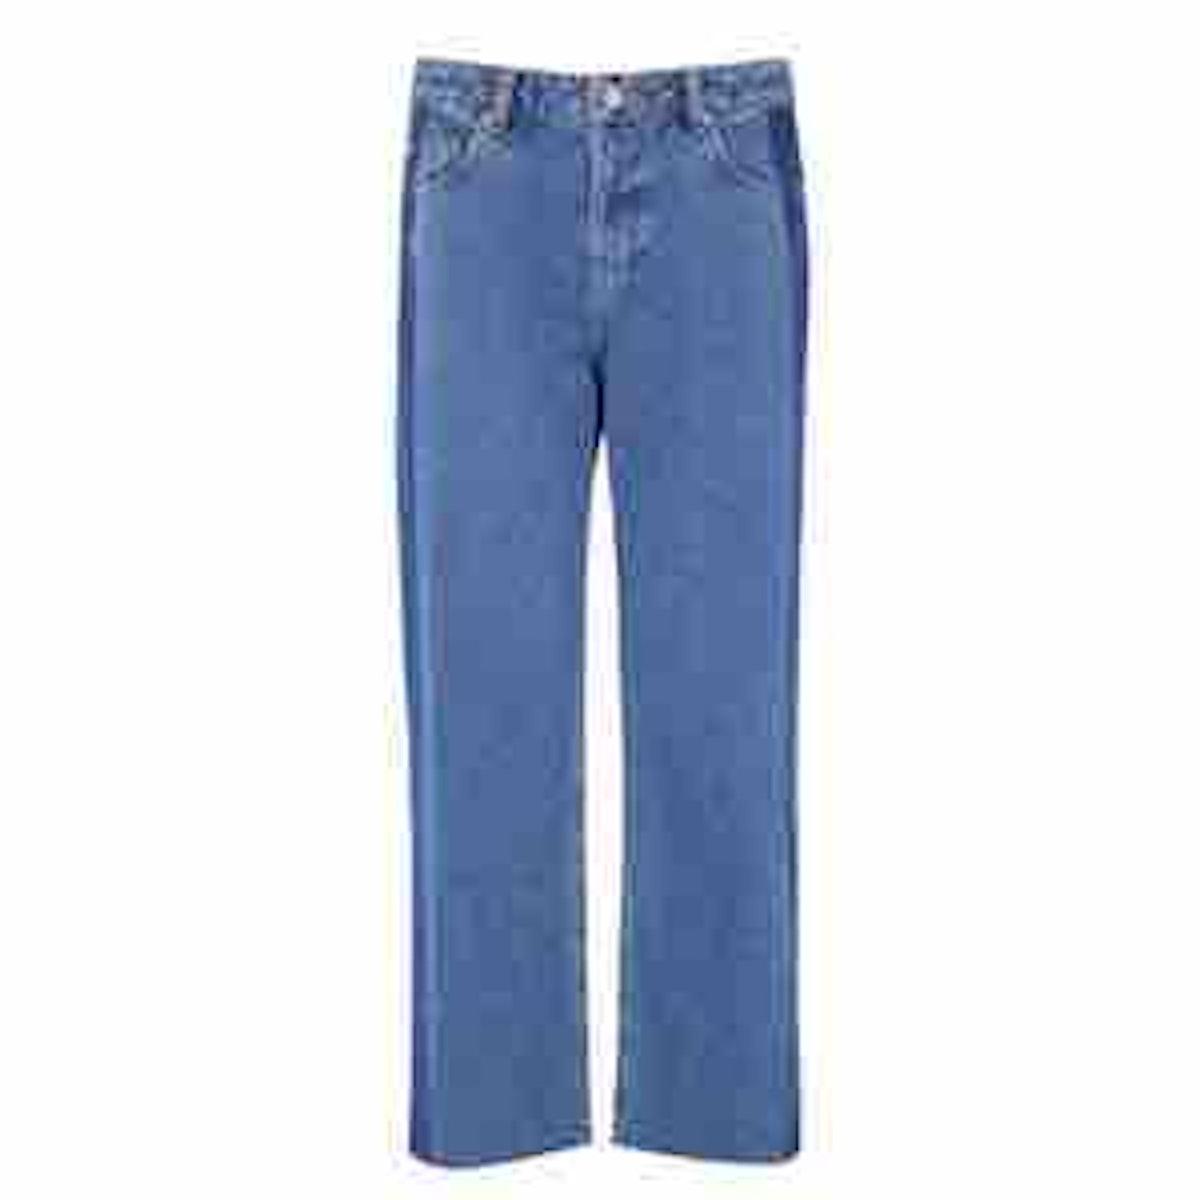 Blocked Jeans